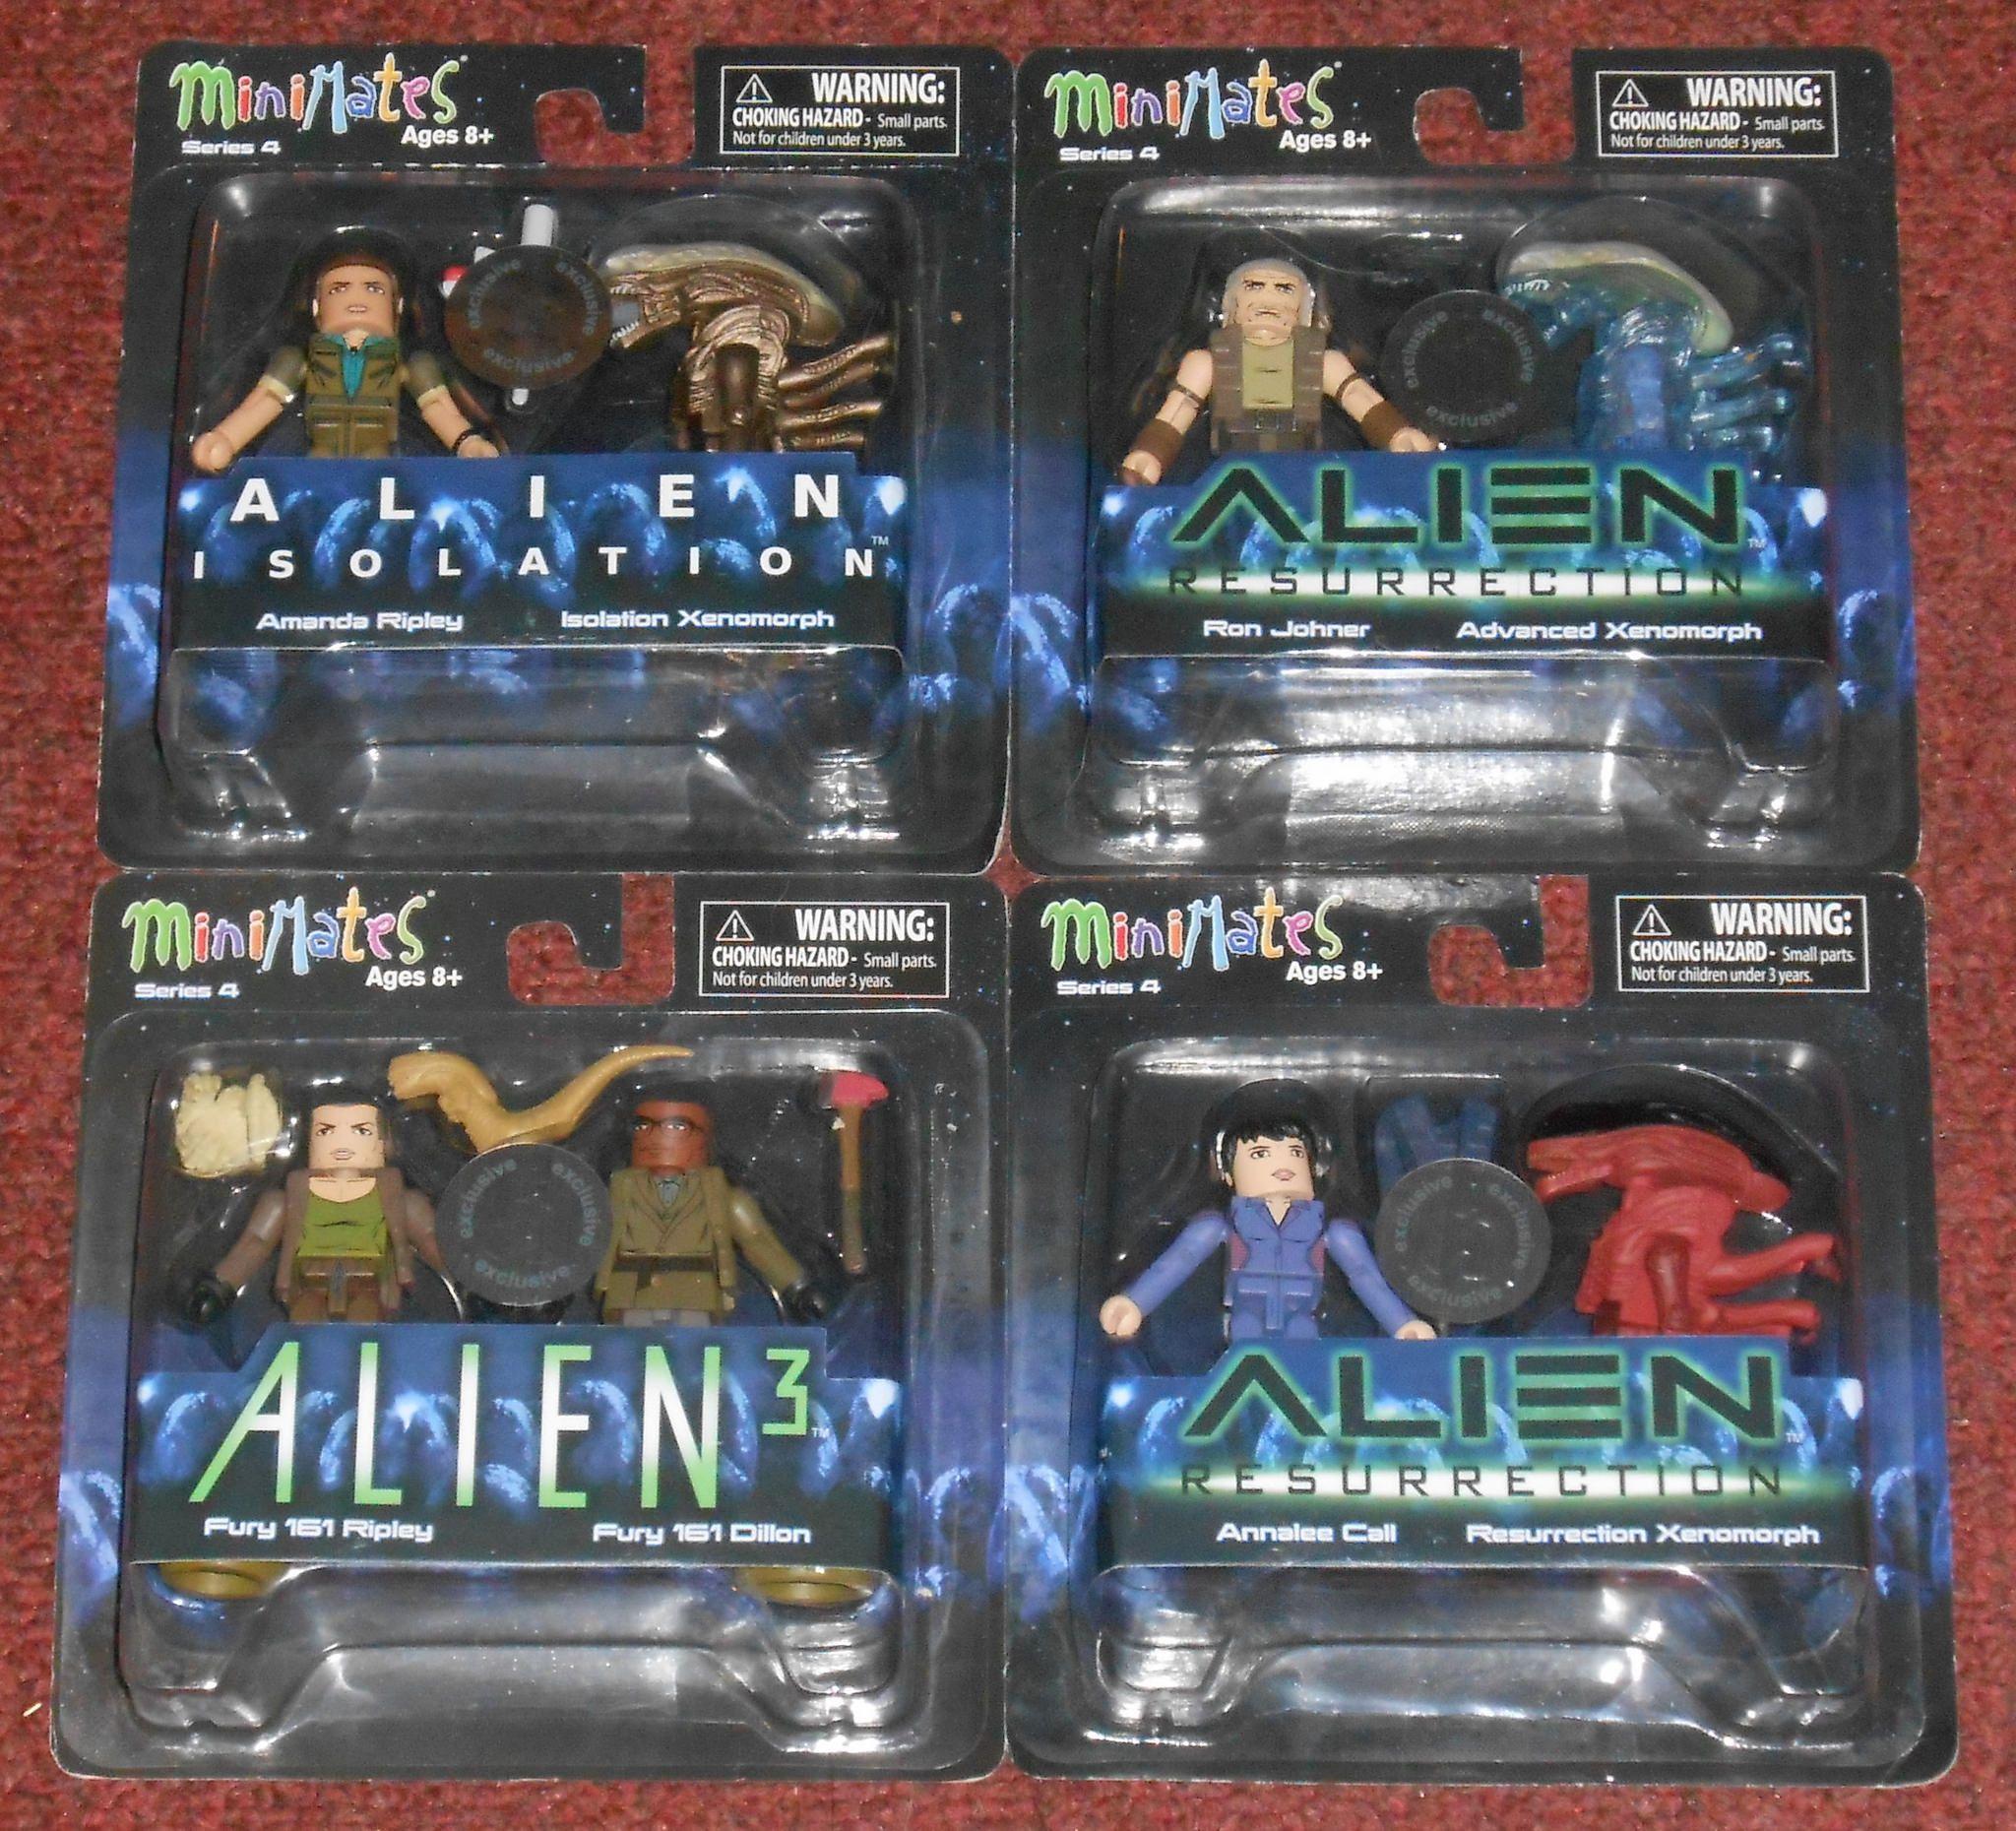 Aliens Minimates TRU Toys R Us Wave 4 Fury 161 Dillon